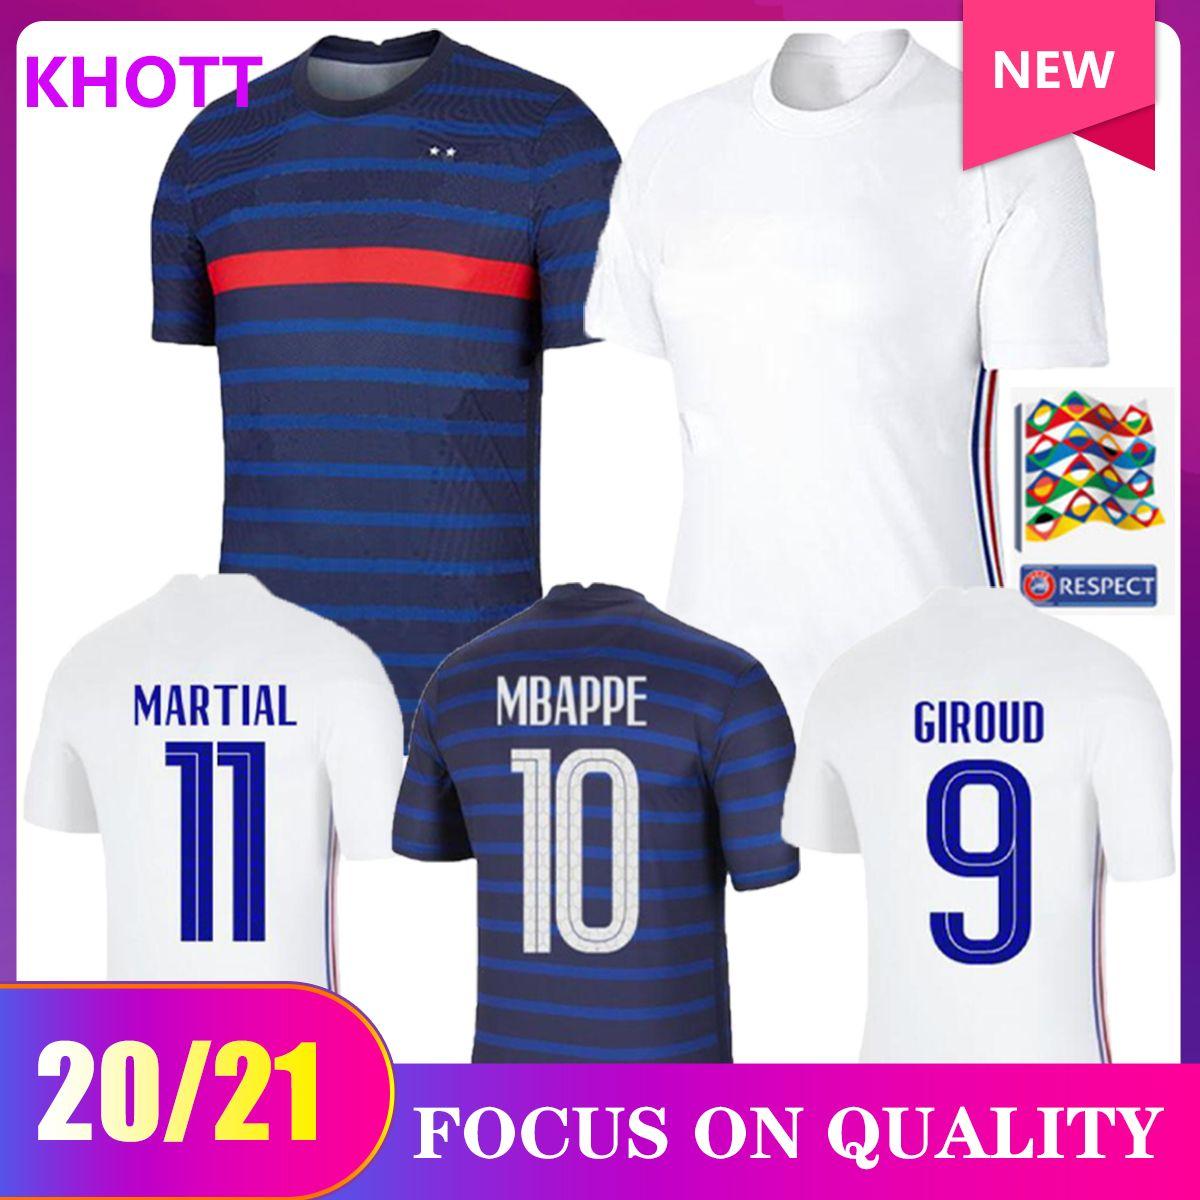 20 21 Griezmann Mbappe 2 stelle French Soccer Jersey Pogba Kante Demblee Varane Matuidi Francia Camicie da calcio Uomo Kit Maillot de Piede